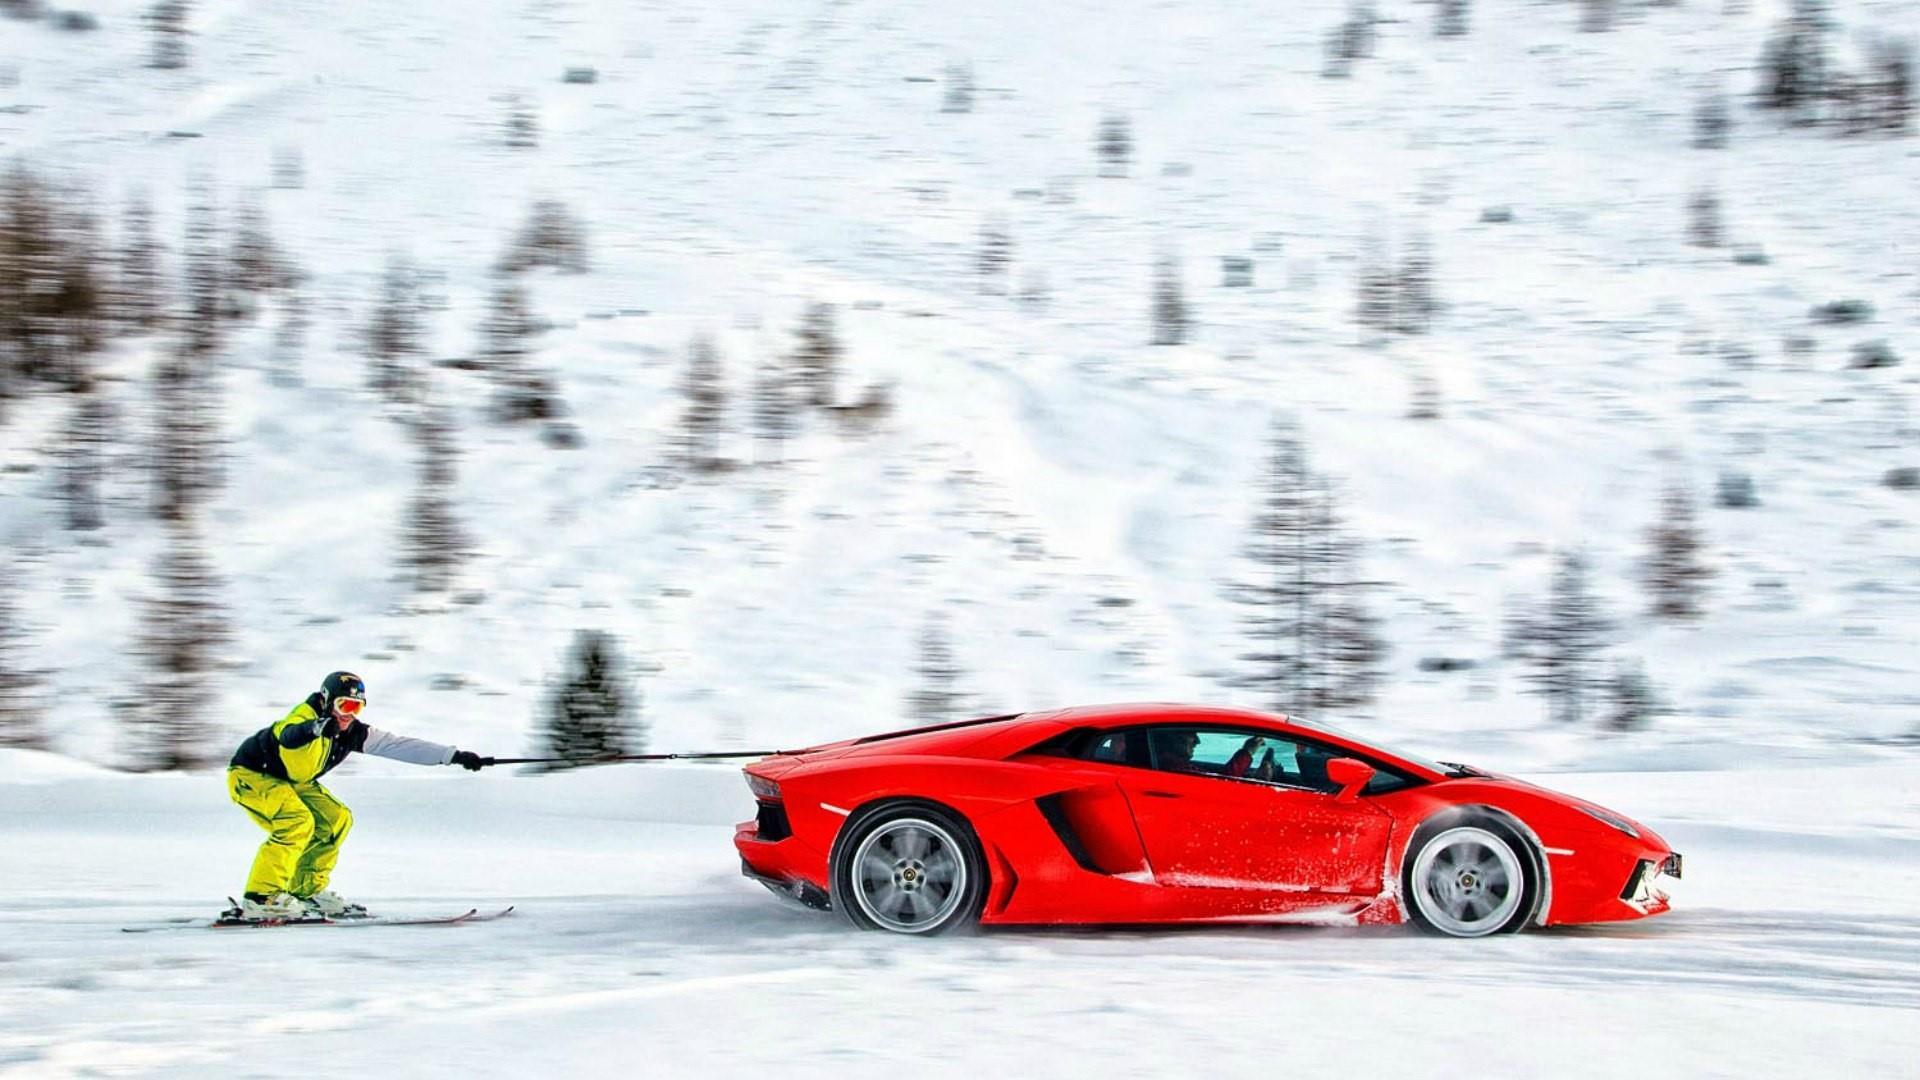 Skiing with a Lamborghini Aventador wallpaper